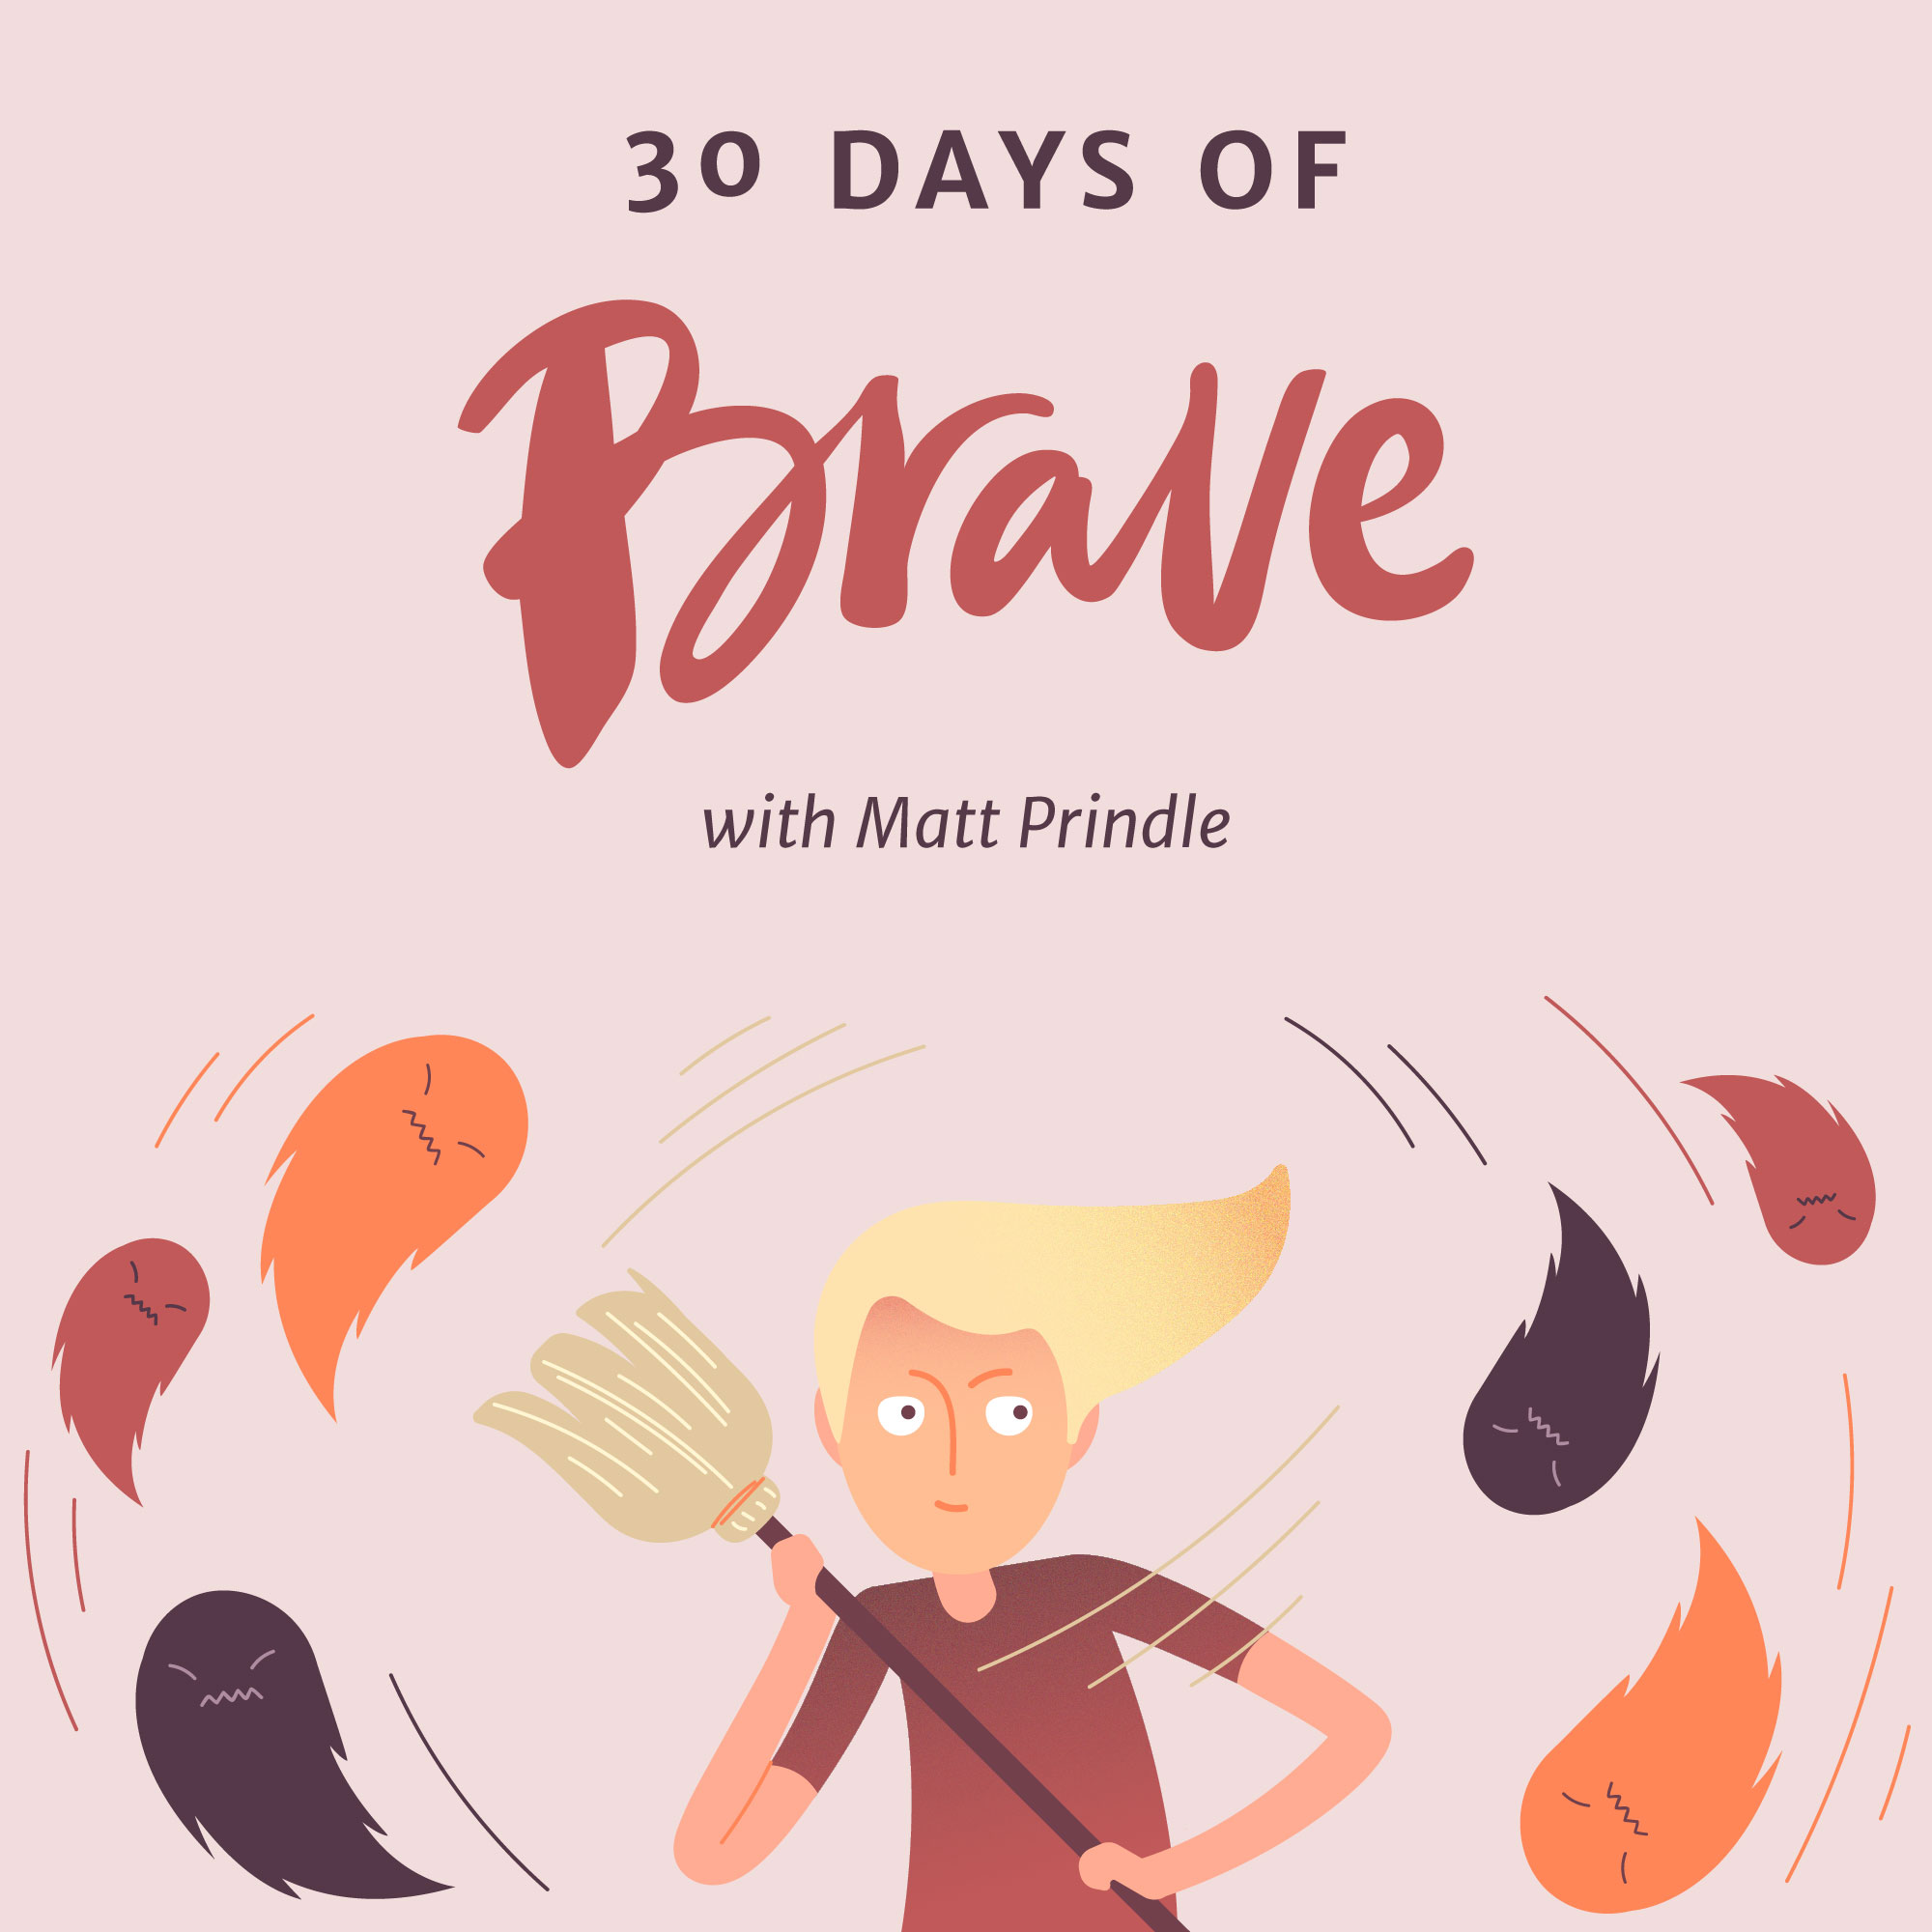 30 Days of Brave